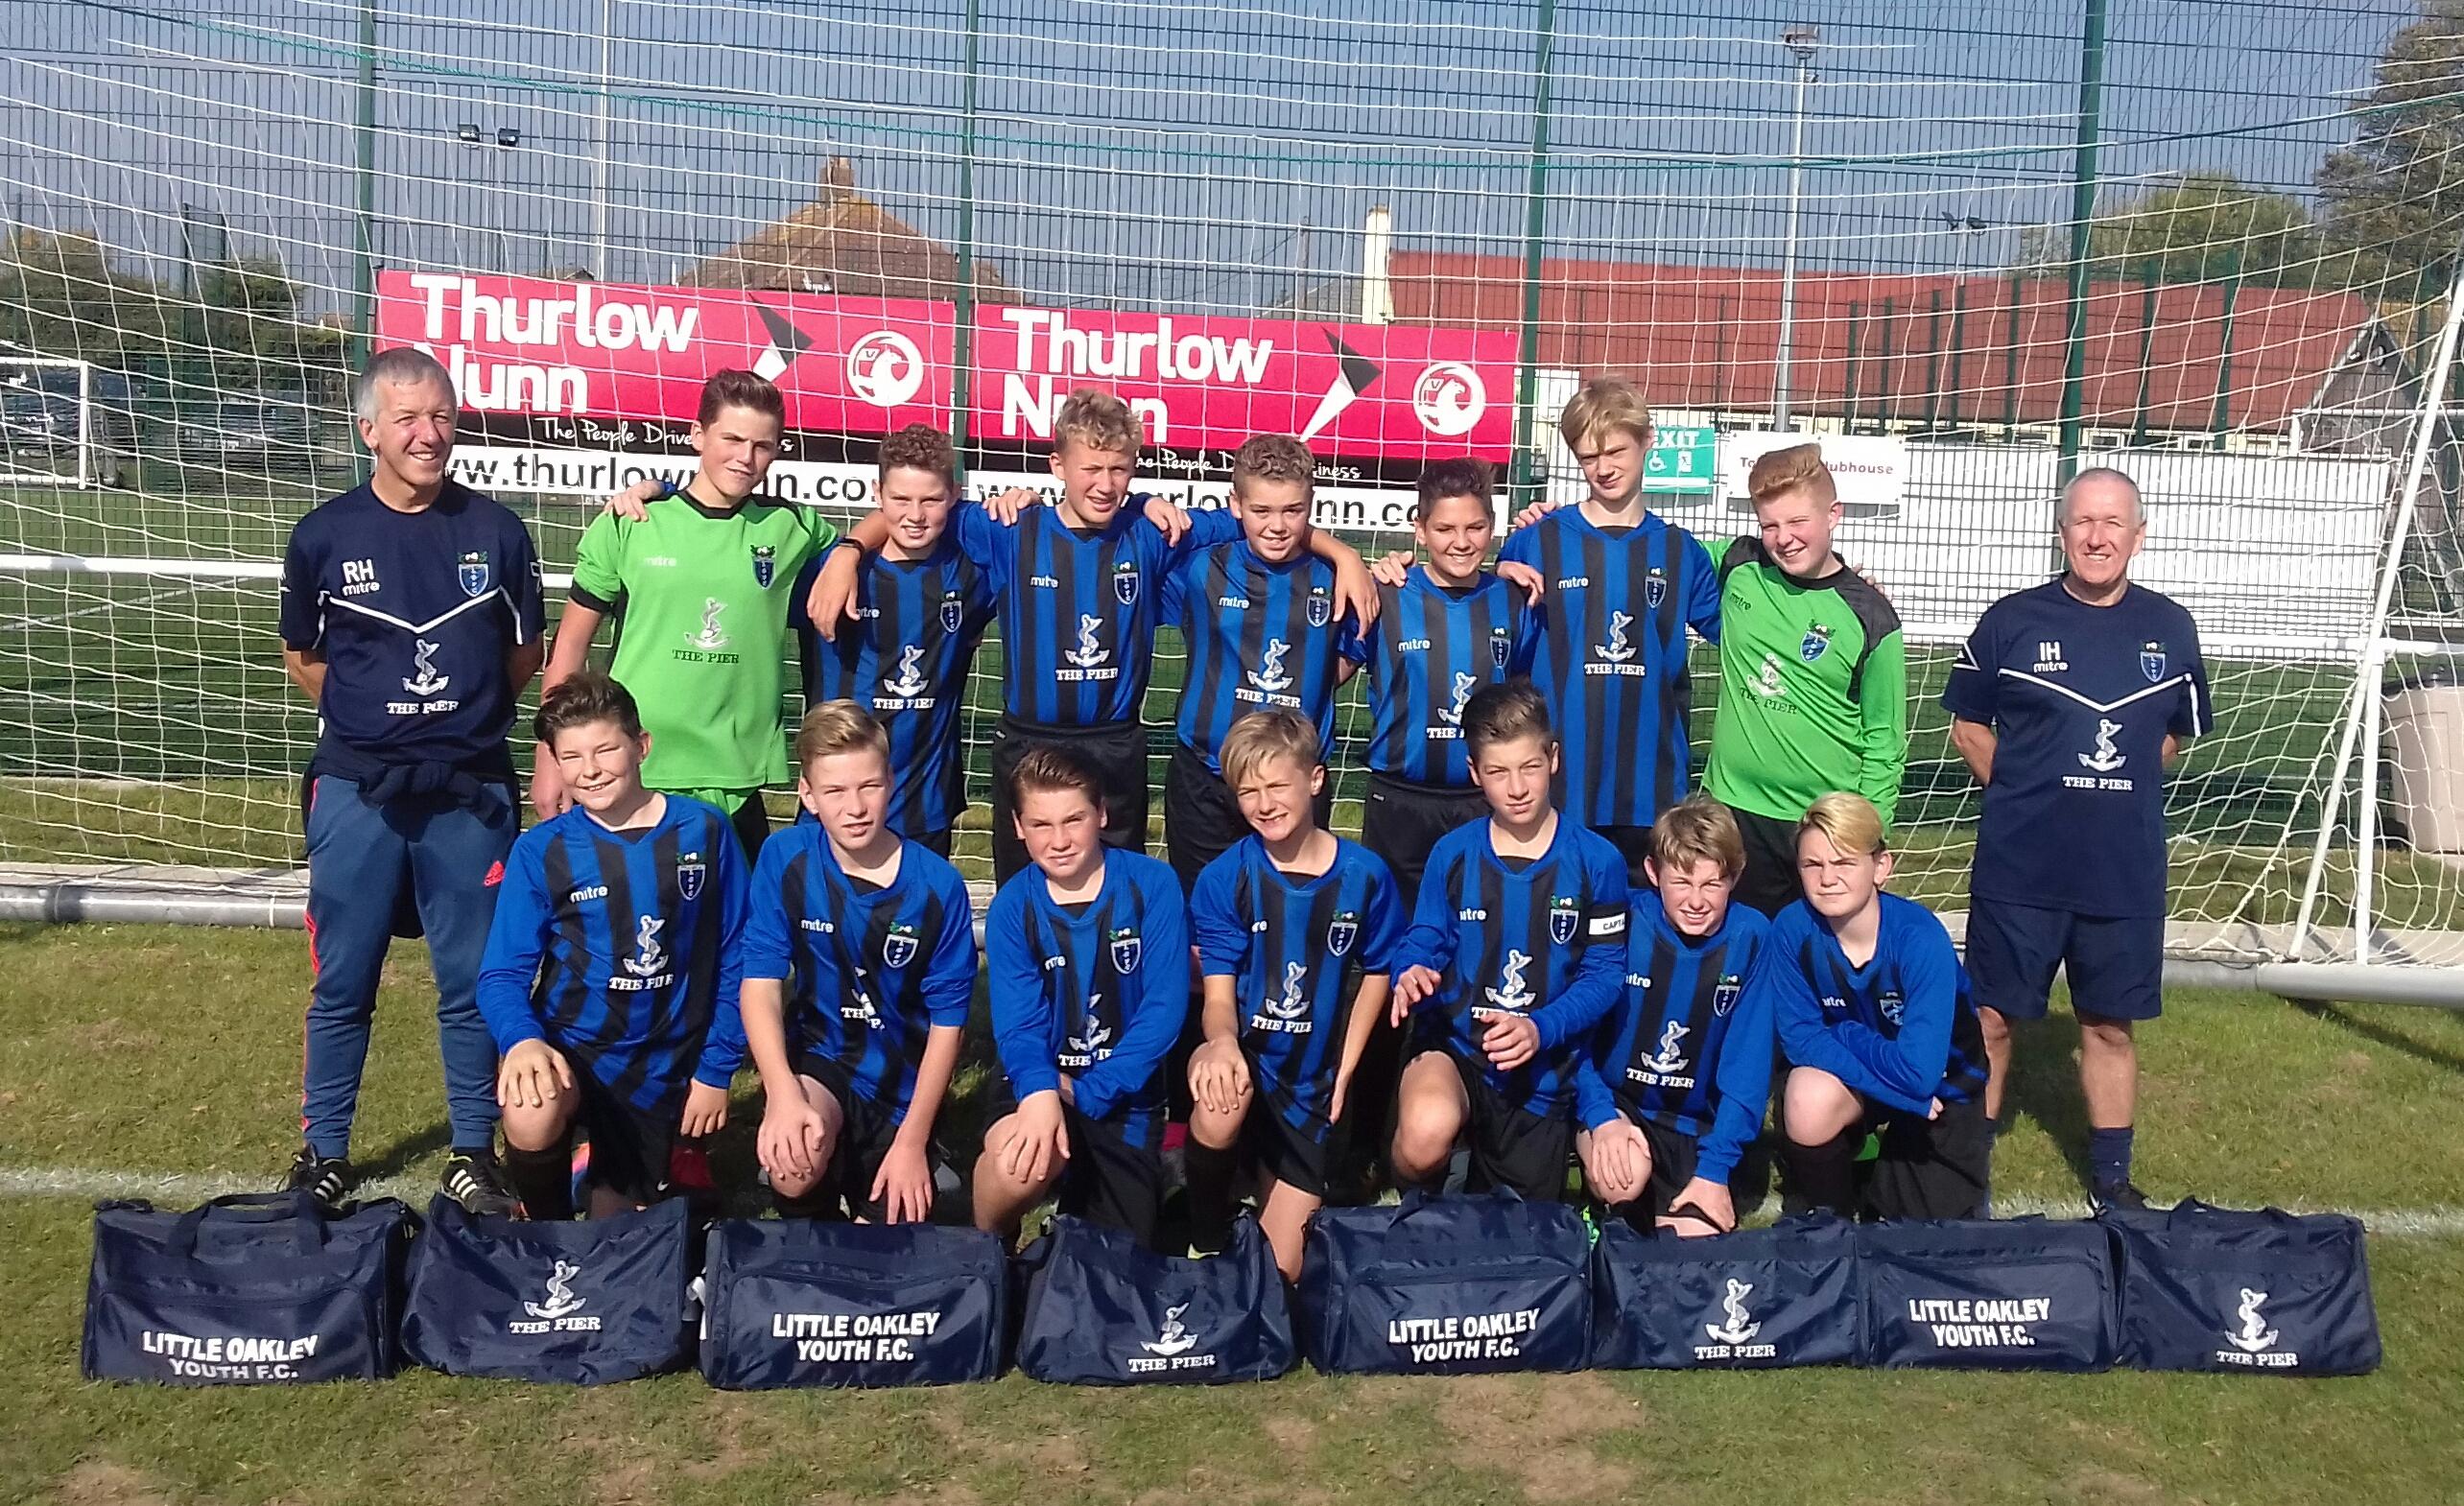 Football Clubs: Little Oakley Football Club Vs. Wivenhoe Tempest